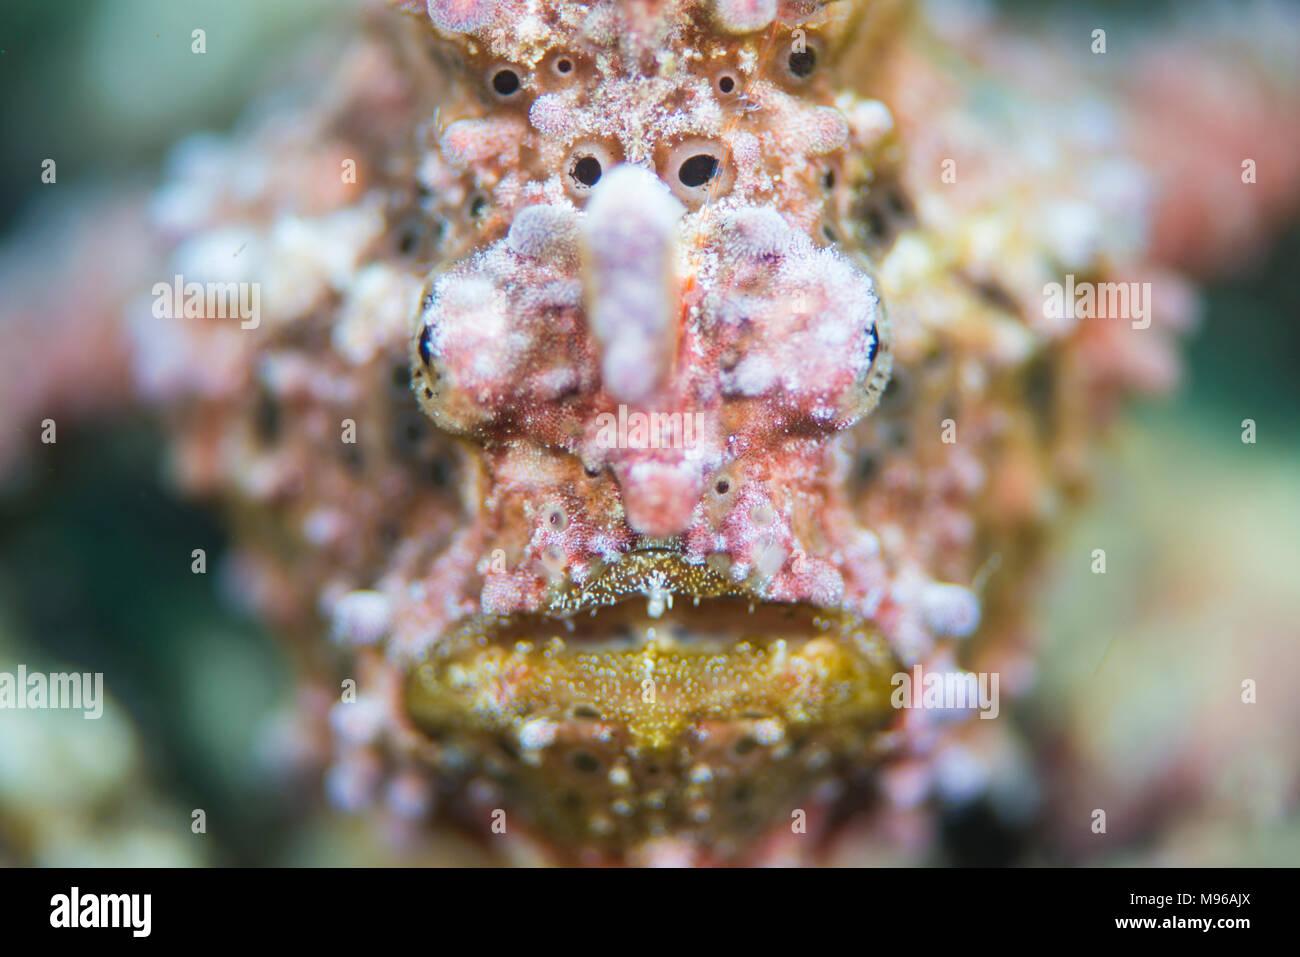 A Warty Frogfish, Antennarius maculatus, Lembeh Island, Lembeh Strait, Pacific Ocean, Indonesia, - Stock Image